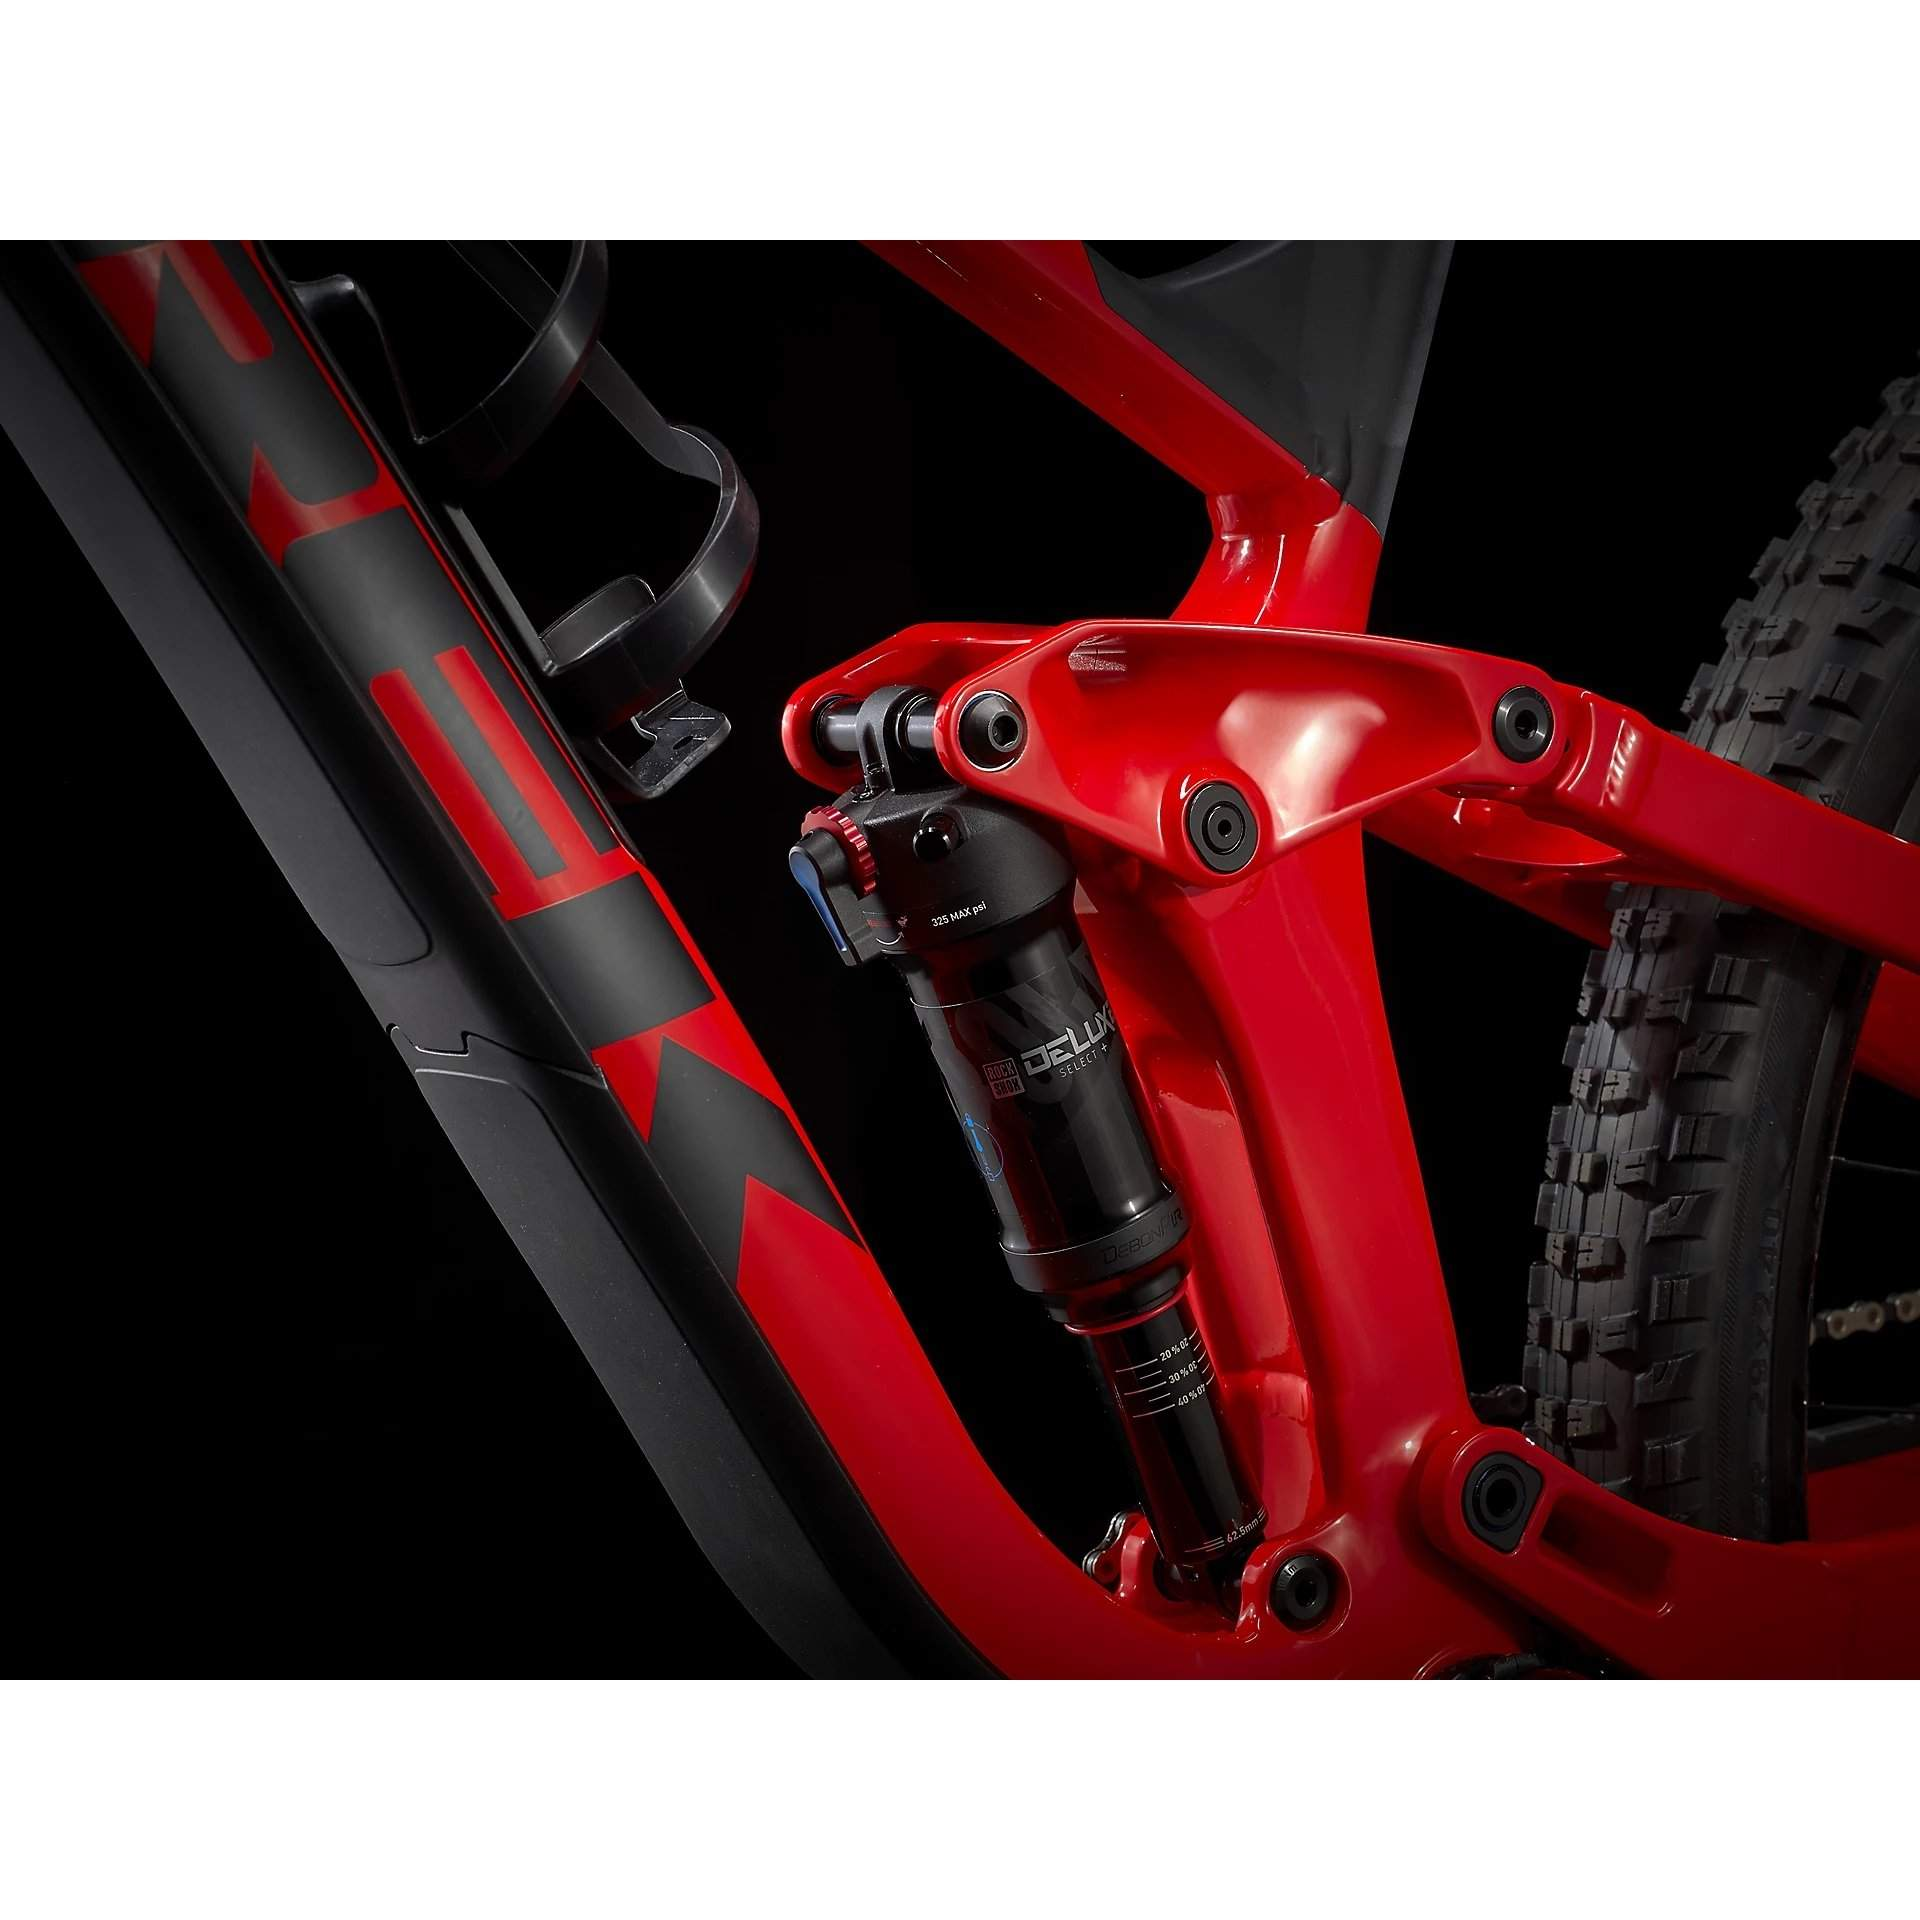 ROWER TREK SLASH 7 GLOSS RADIOACTIVE RED|MATTE BLACK 6